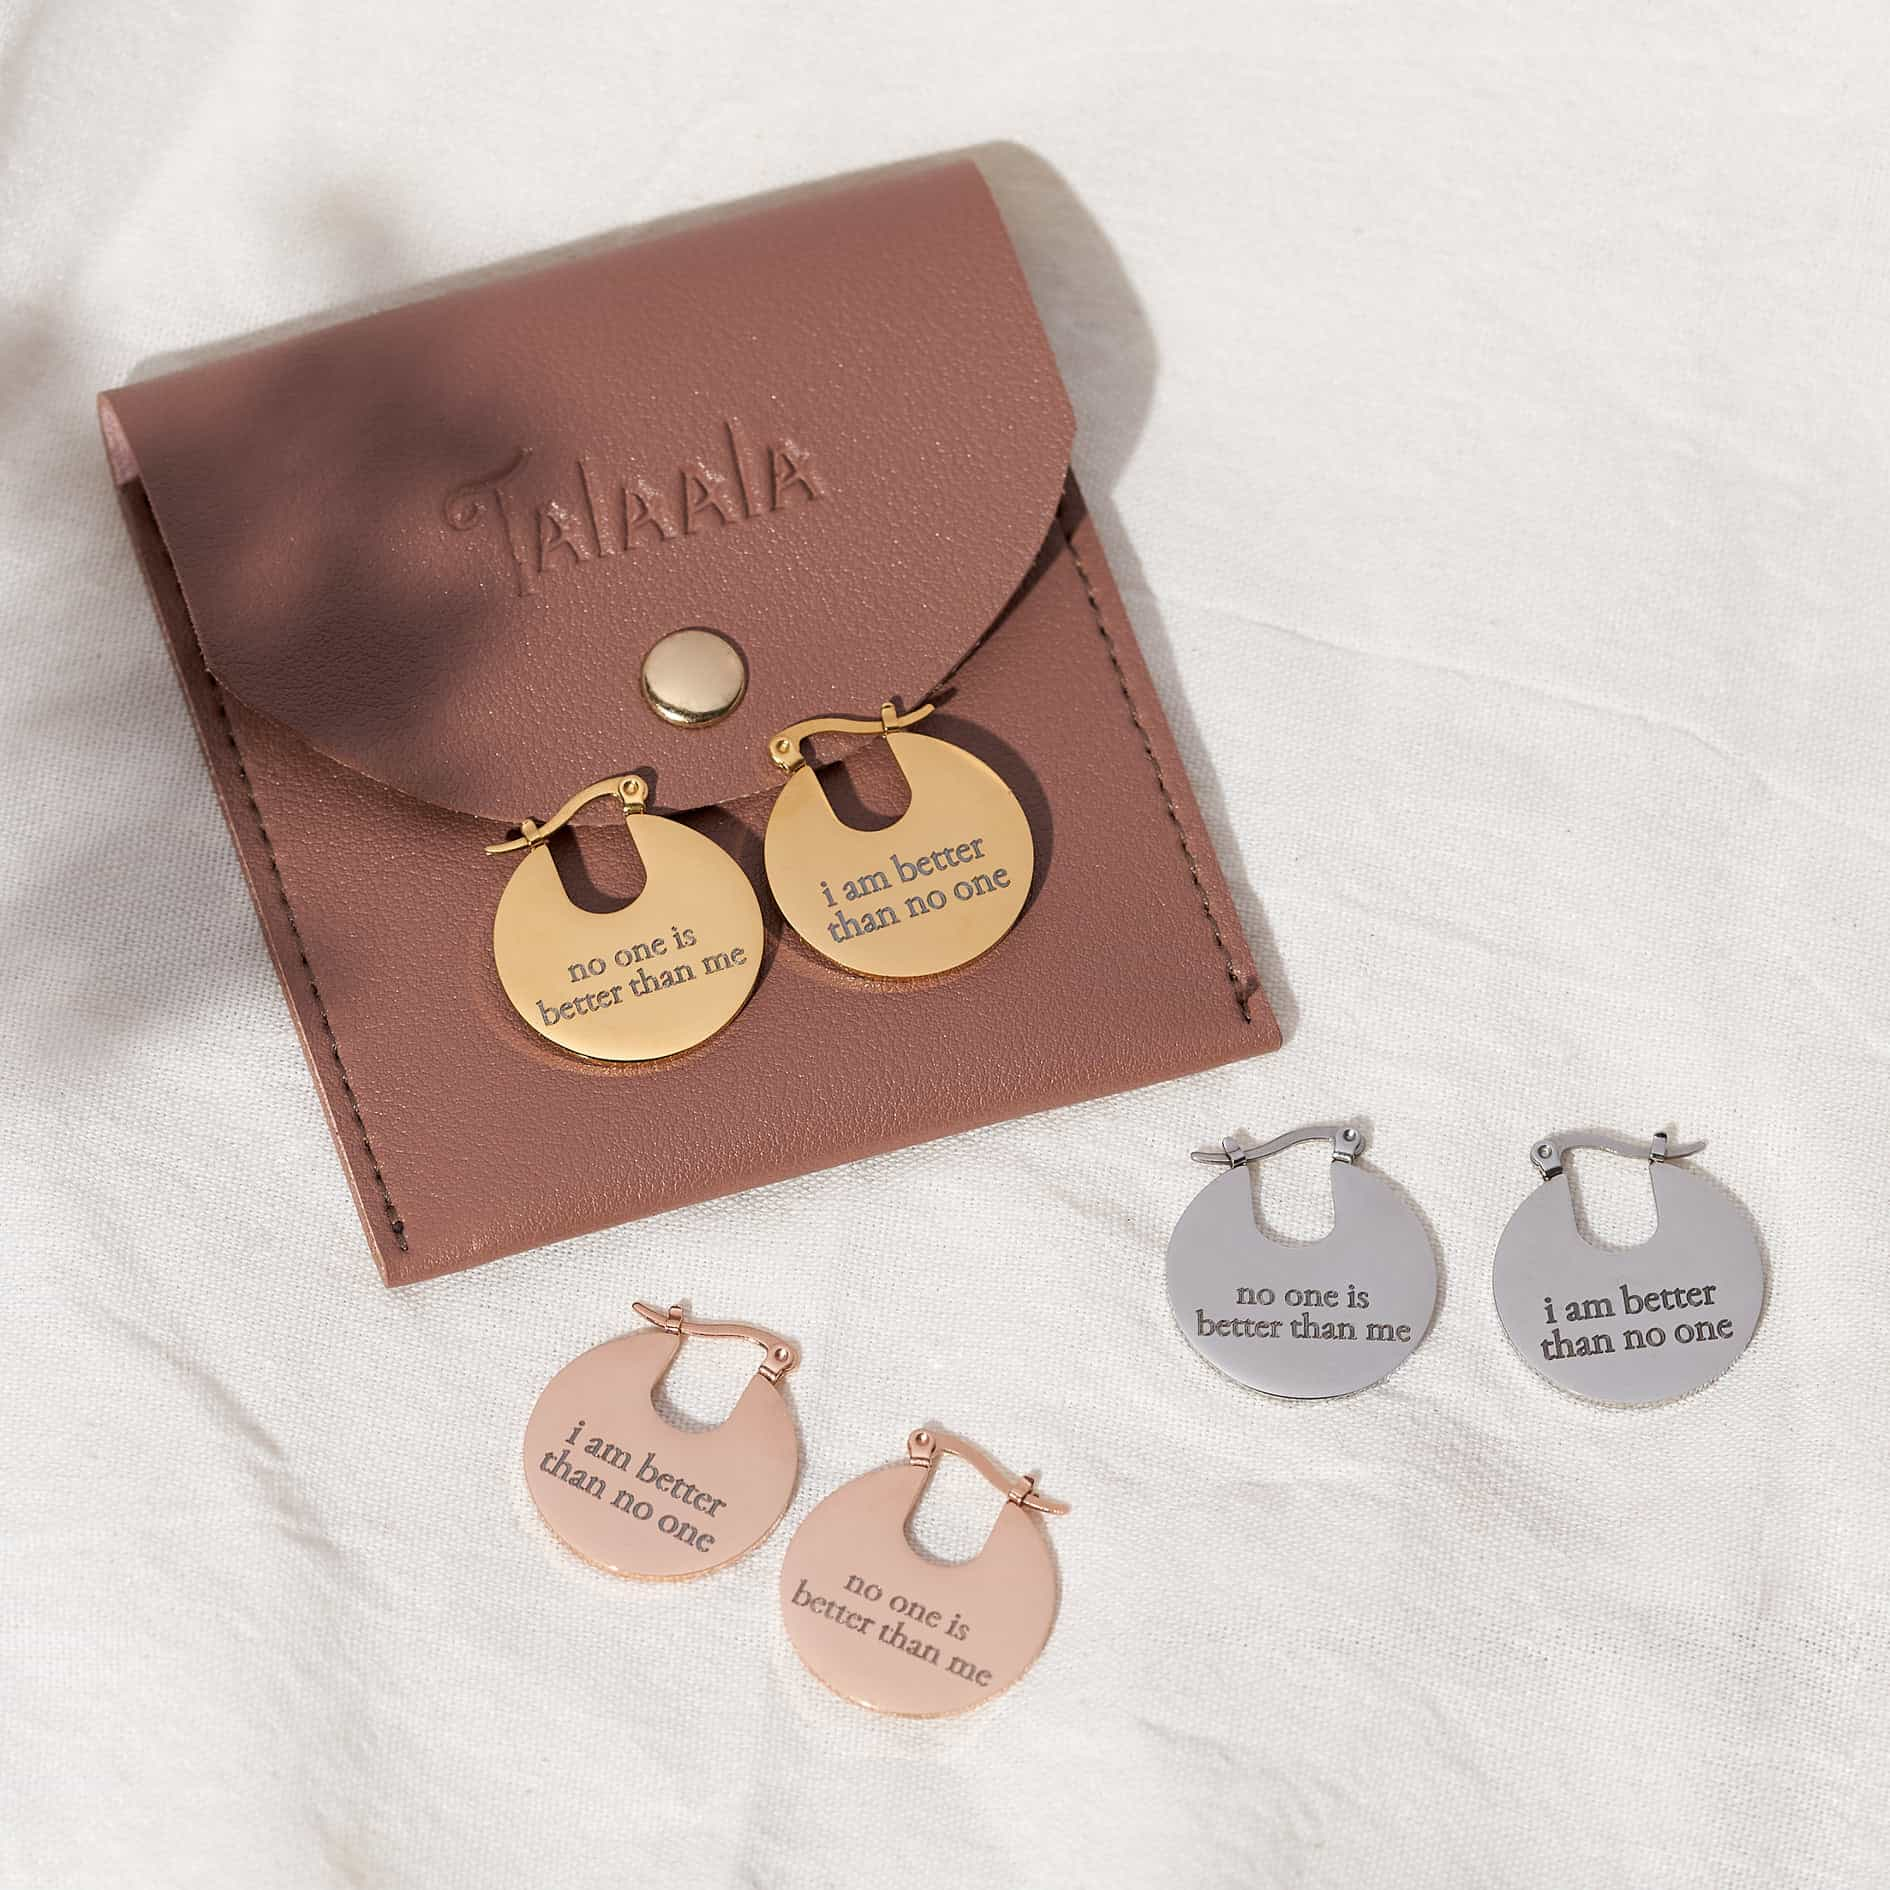 Ayn Bernos x Talaala PH jewelry collection: earrings